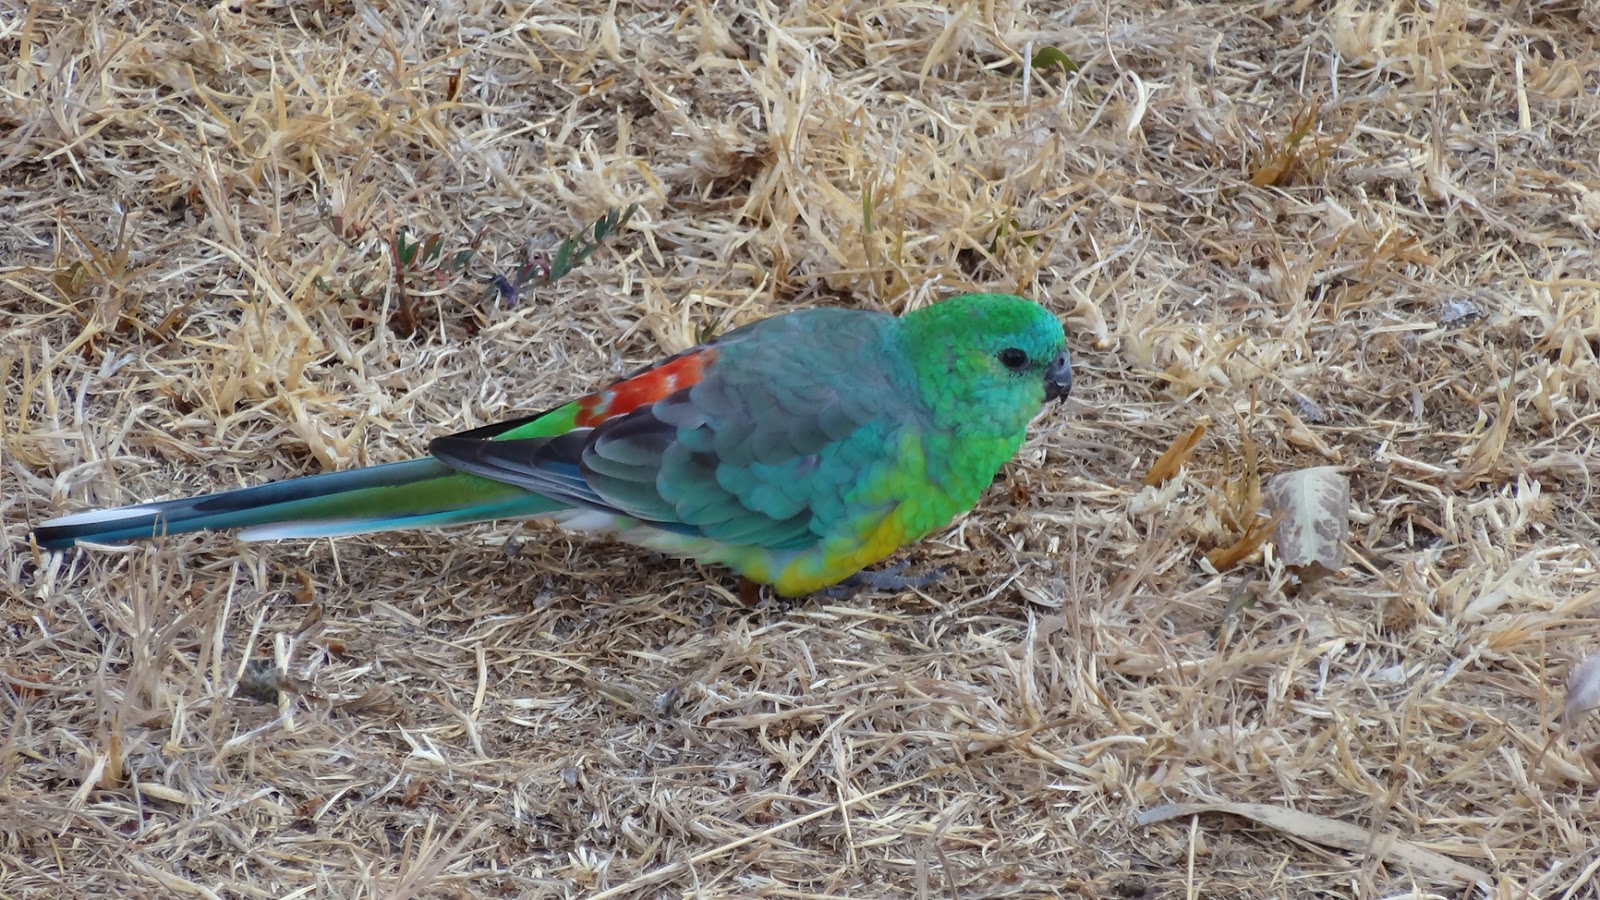 Backyard Bird Identification (IDENTIFY YOUR VISITORS)